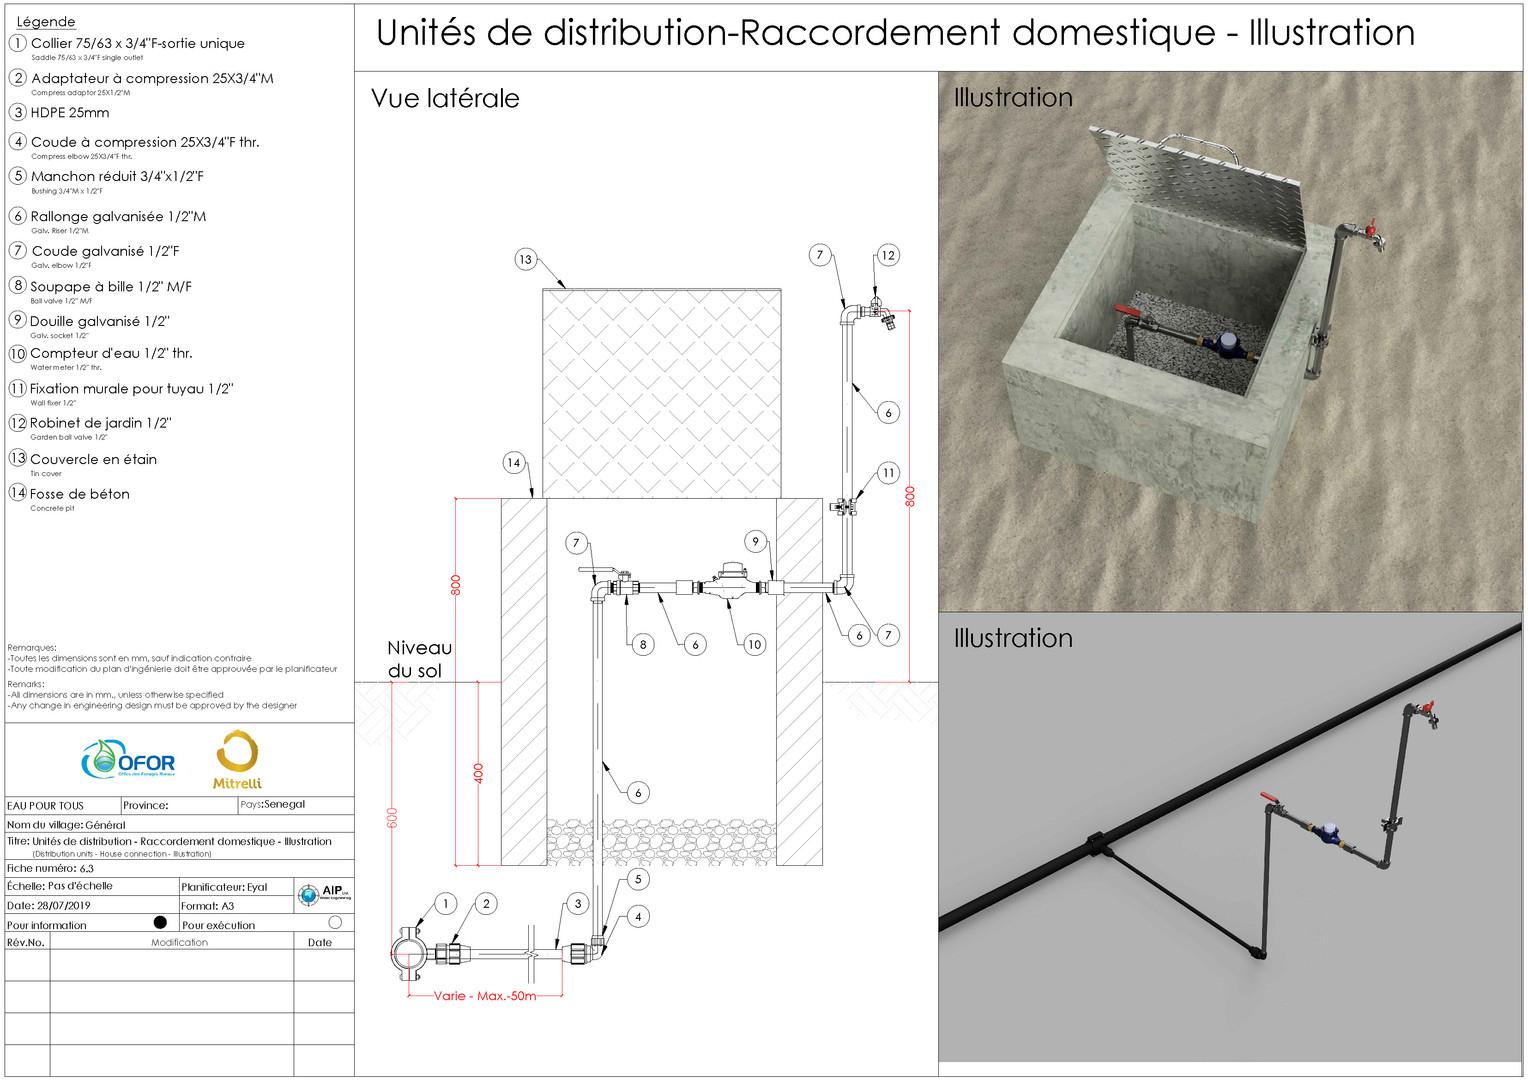 6.3-Distribution units -House connection